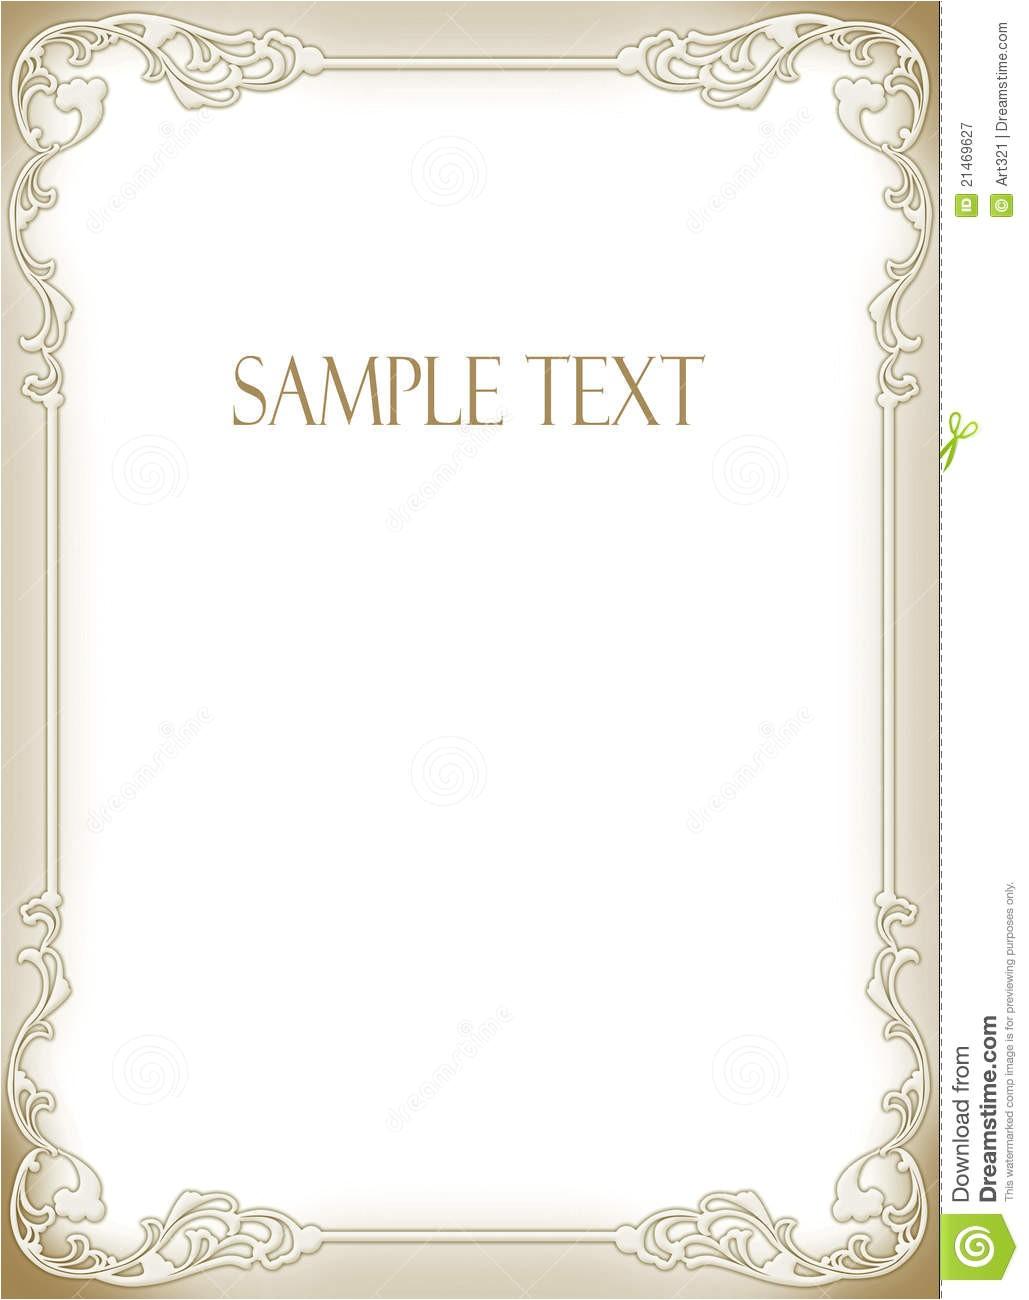 royalty free stock photography wedding invitation frame image21469627